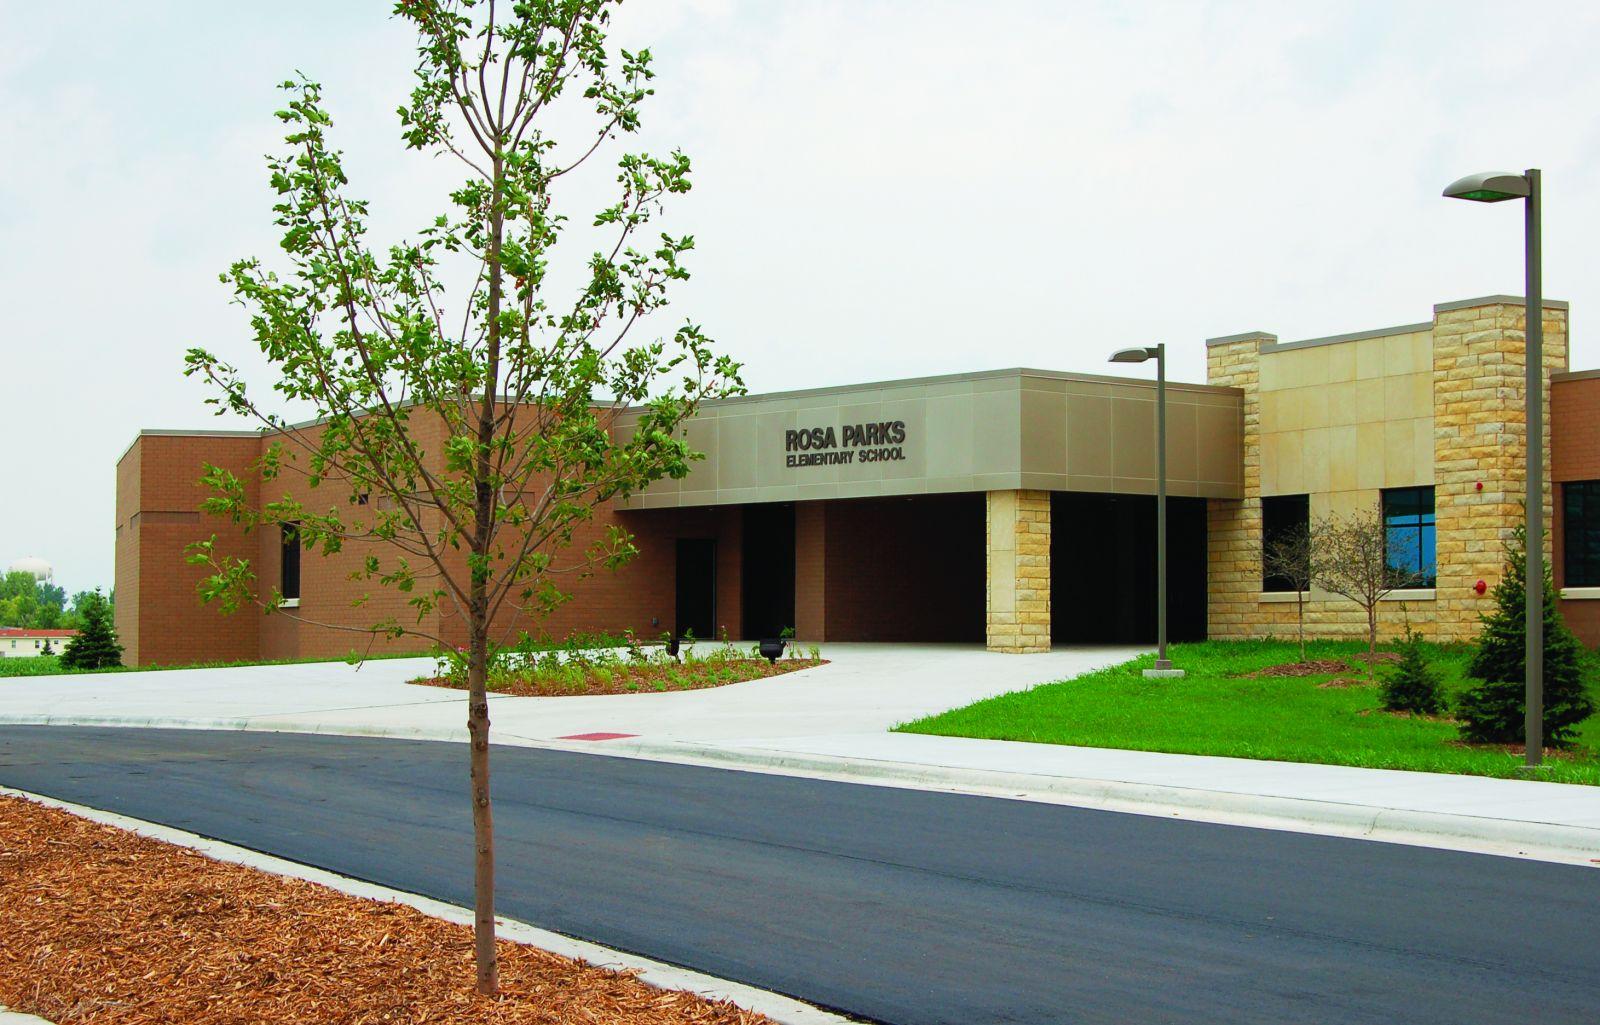 Escuelas Verdes Rosa Parks Elementary School